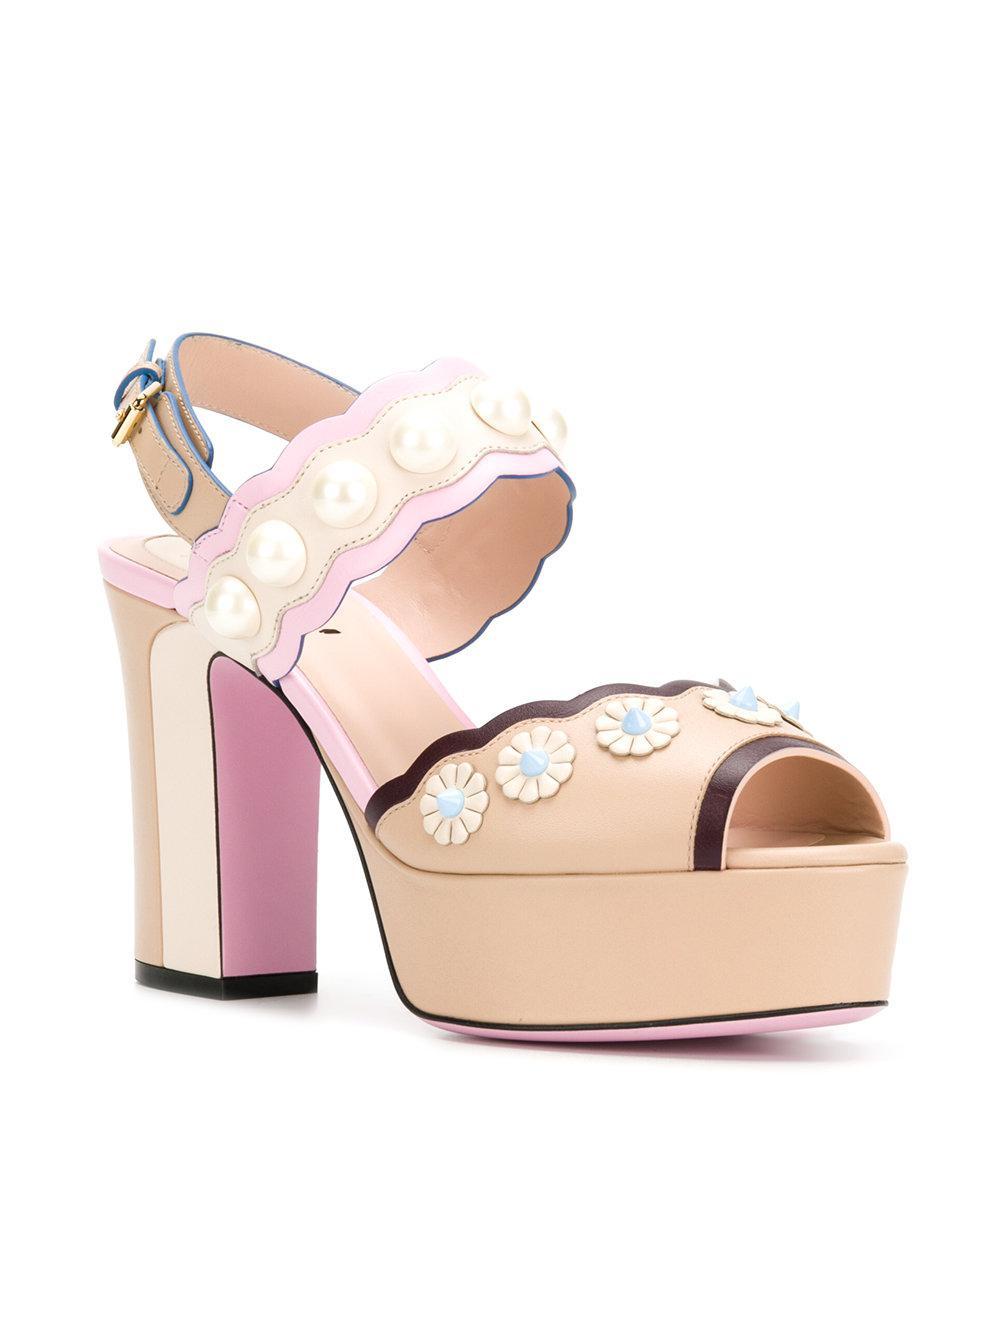 scalloped open toe sandals - Nude & Neutrals Fendi O5Kn3